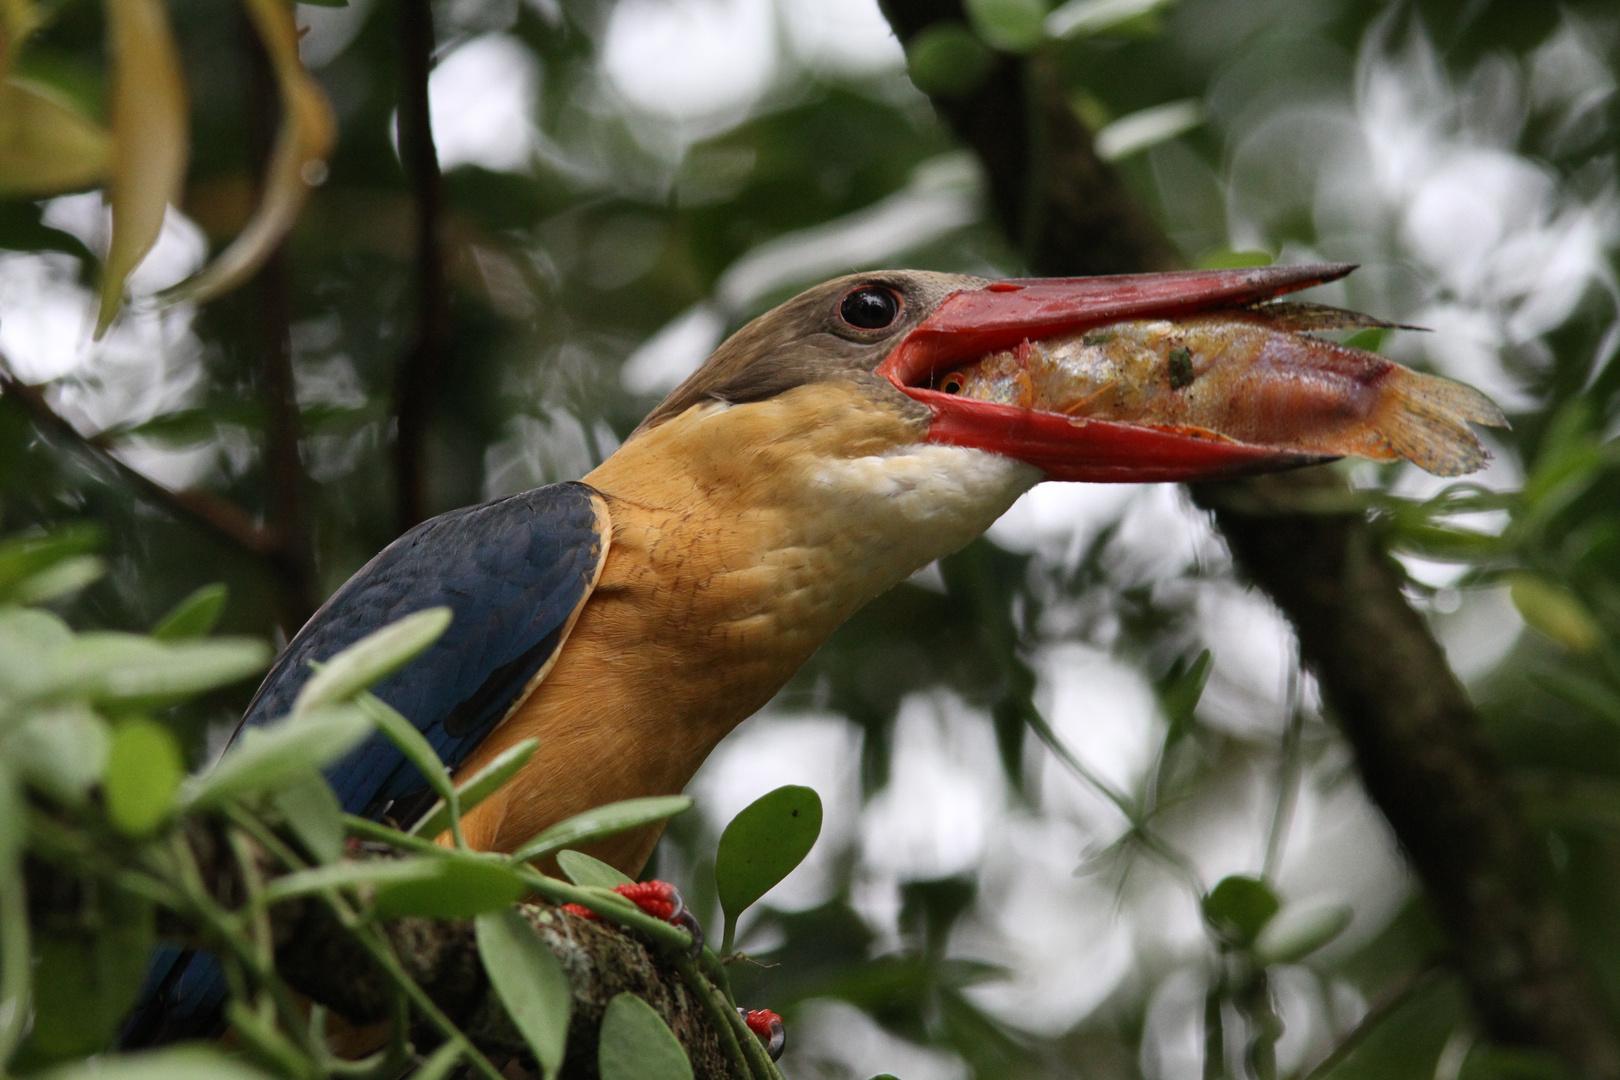 Bird with prey